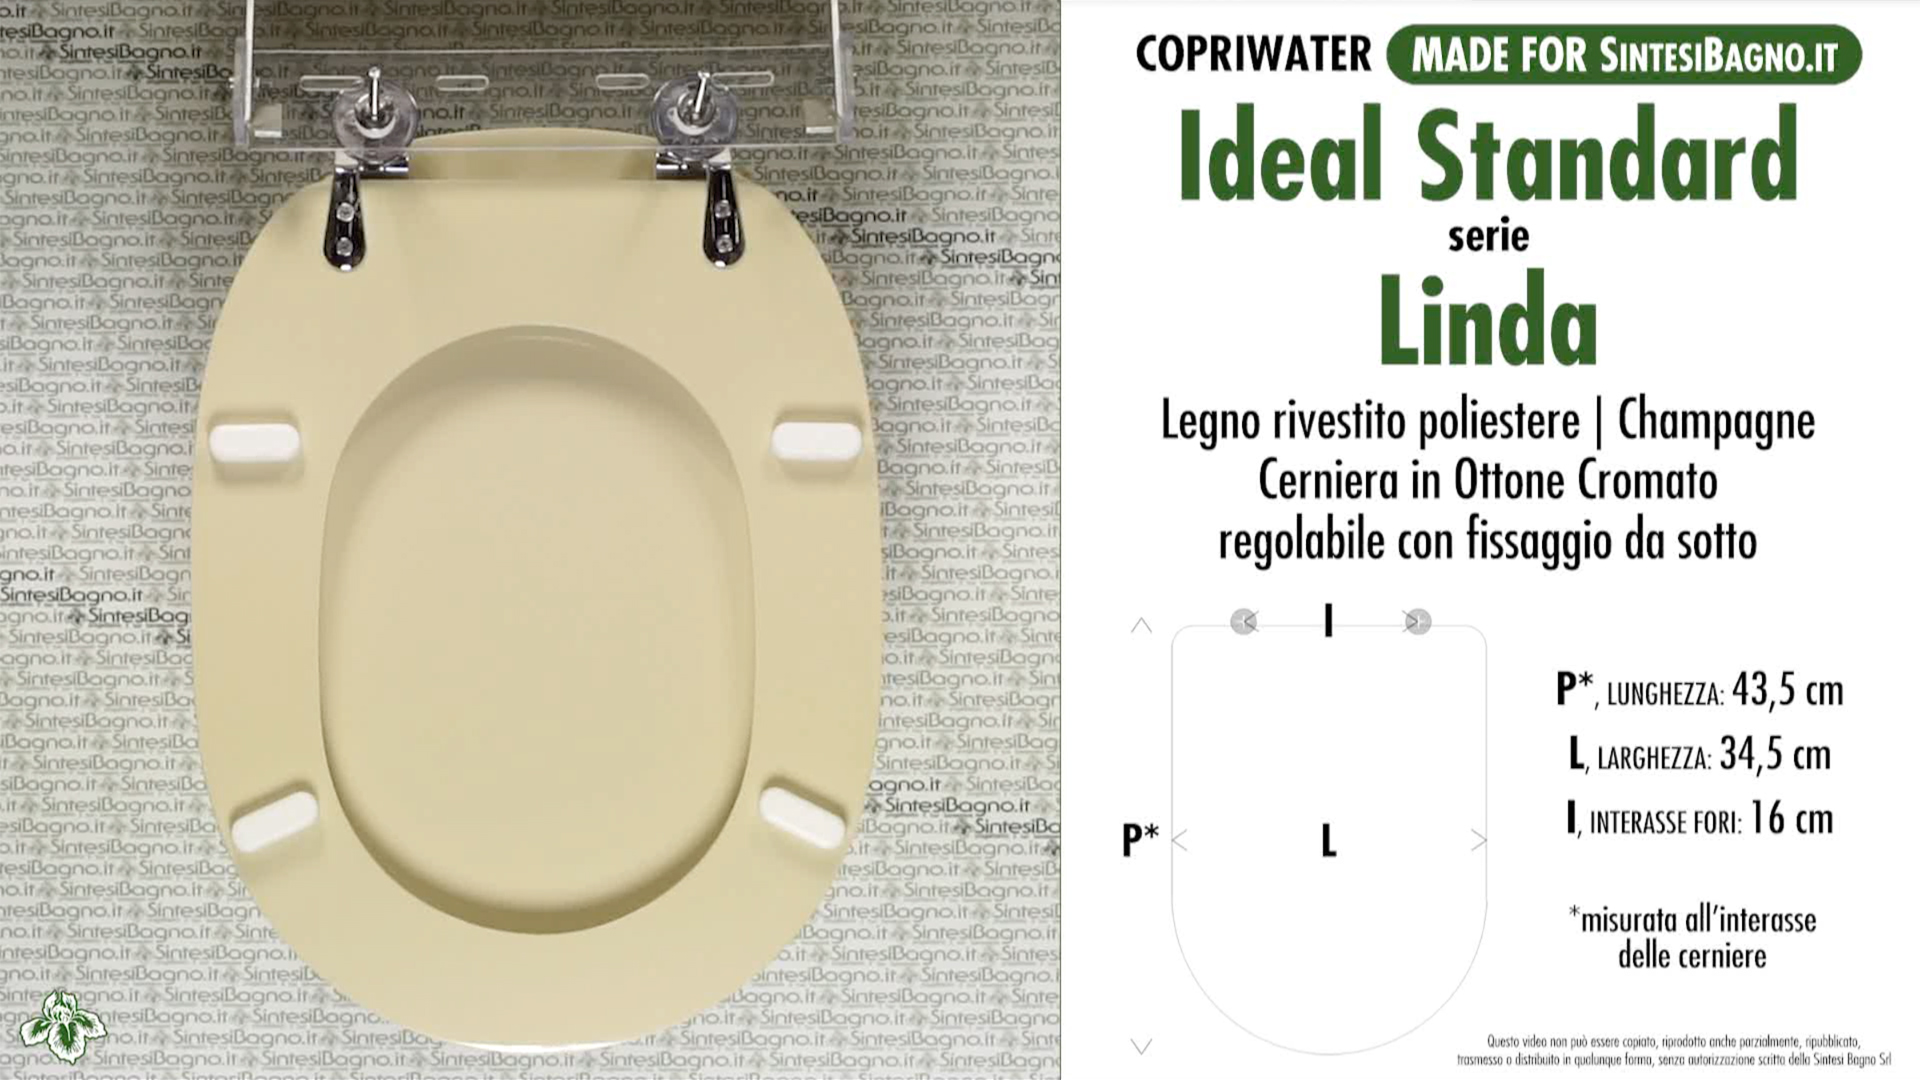 Schede tecniche misure copriwater ideal standard serie linda for Calla ideal standard scheda tecnica